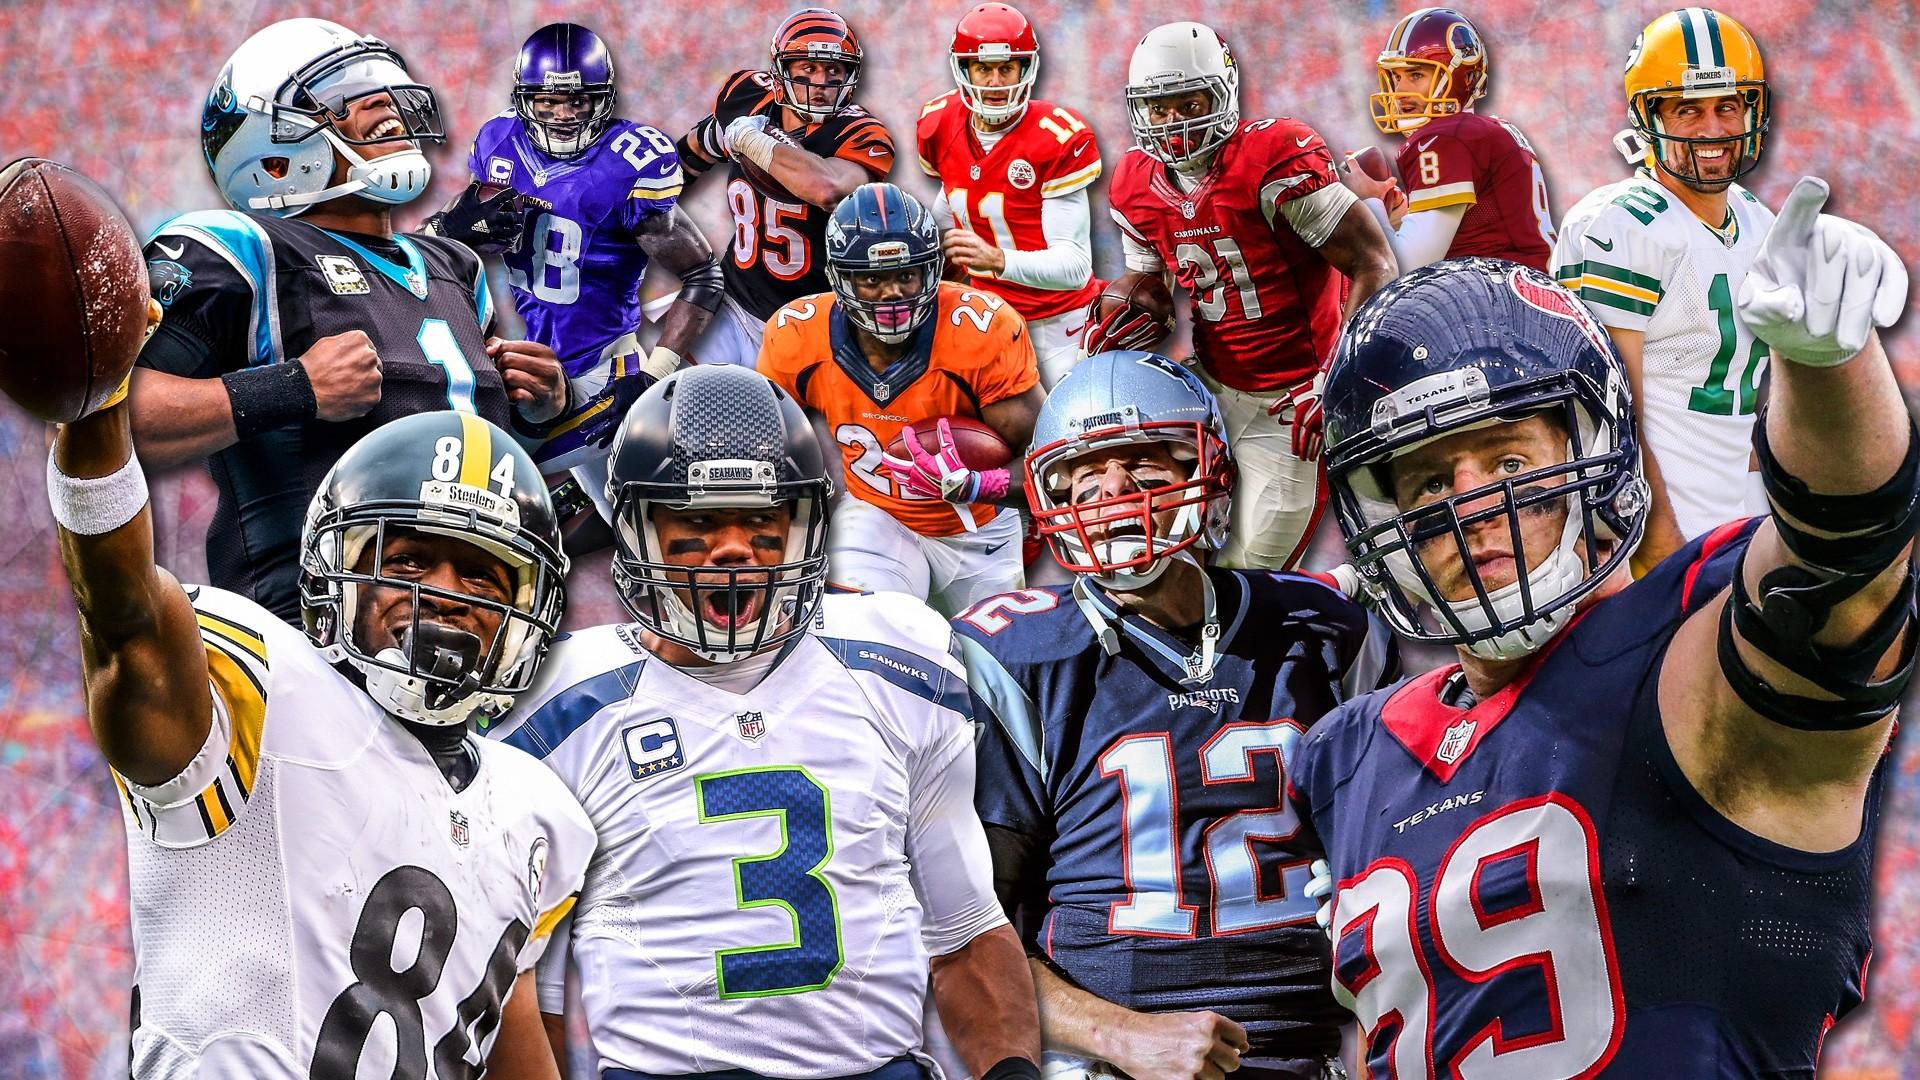 NFL Teams Wallpaper 2018 (89+ images)